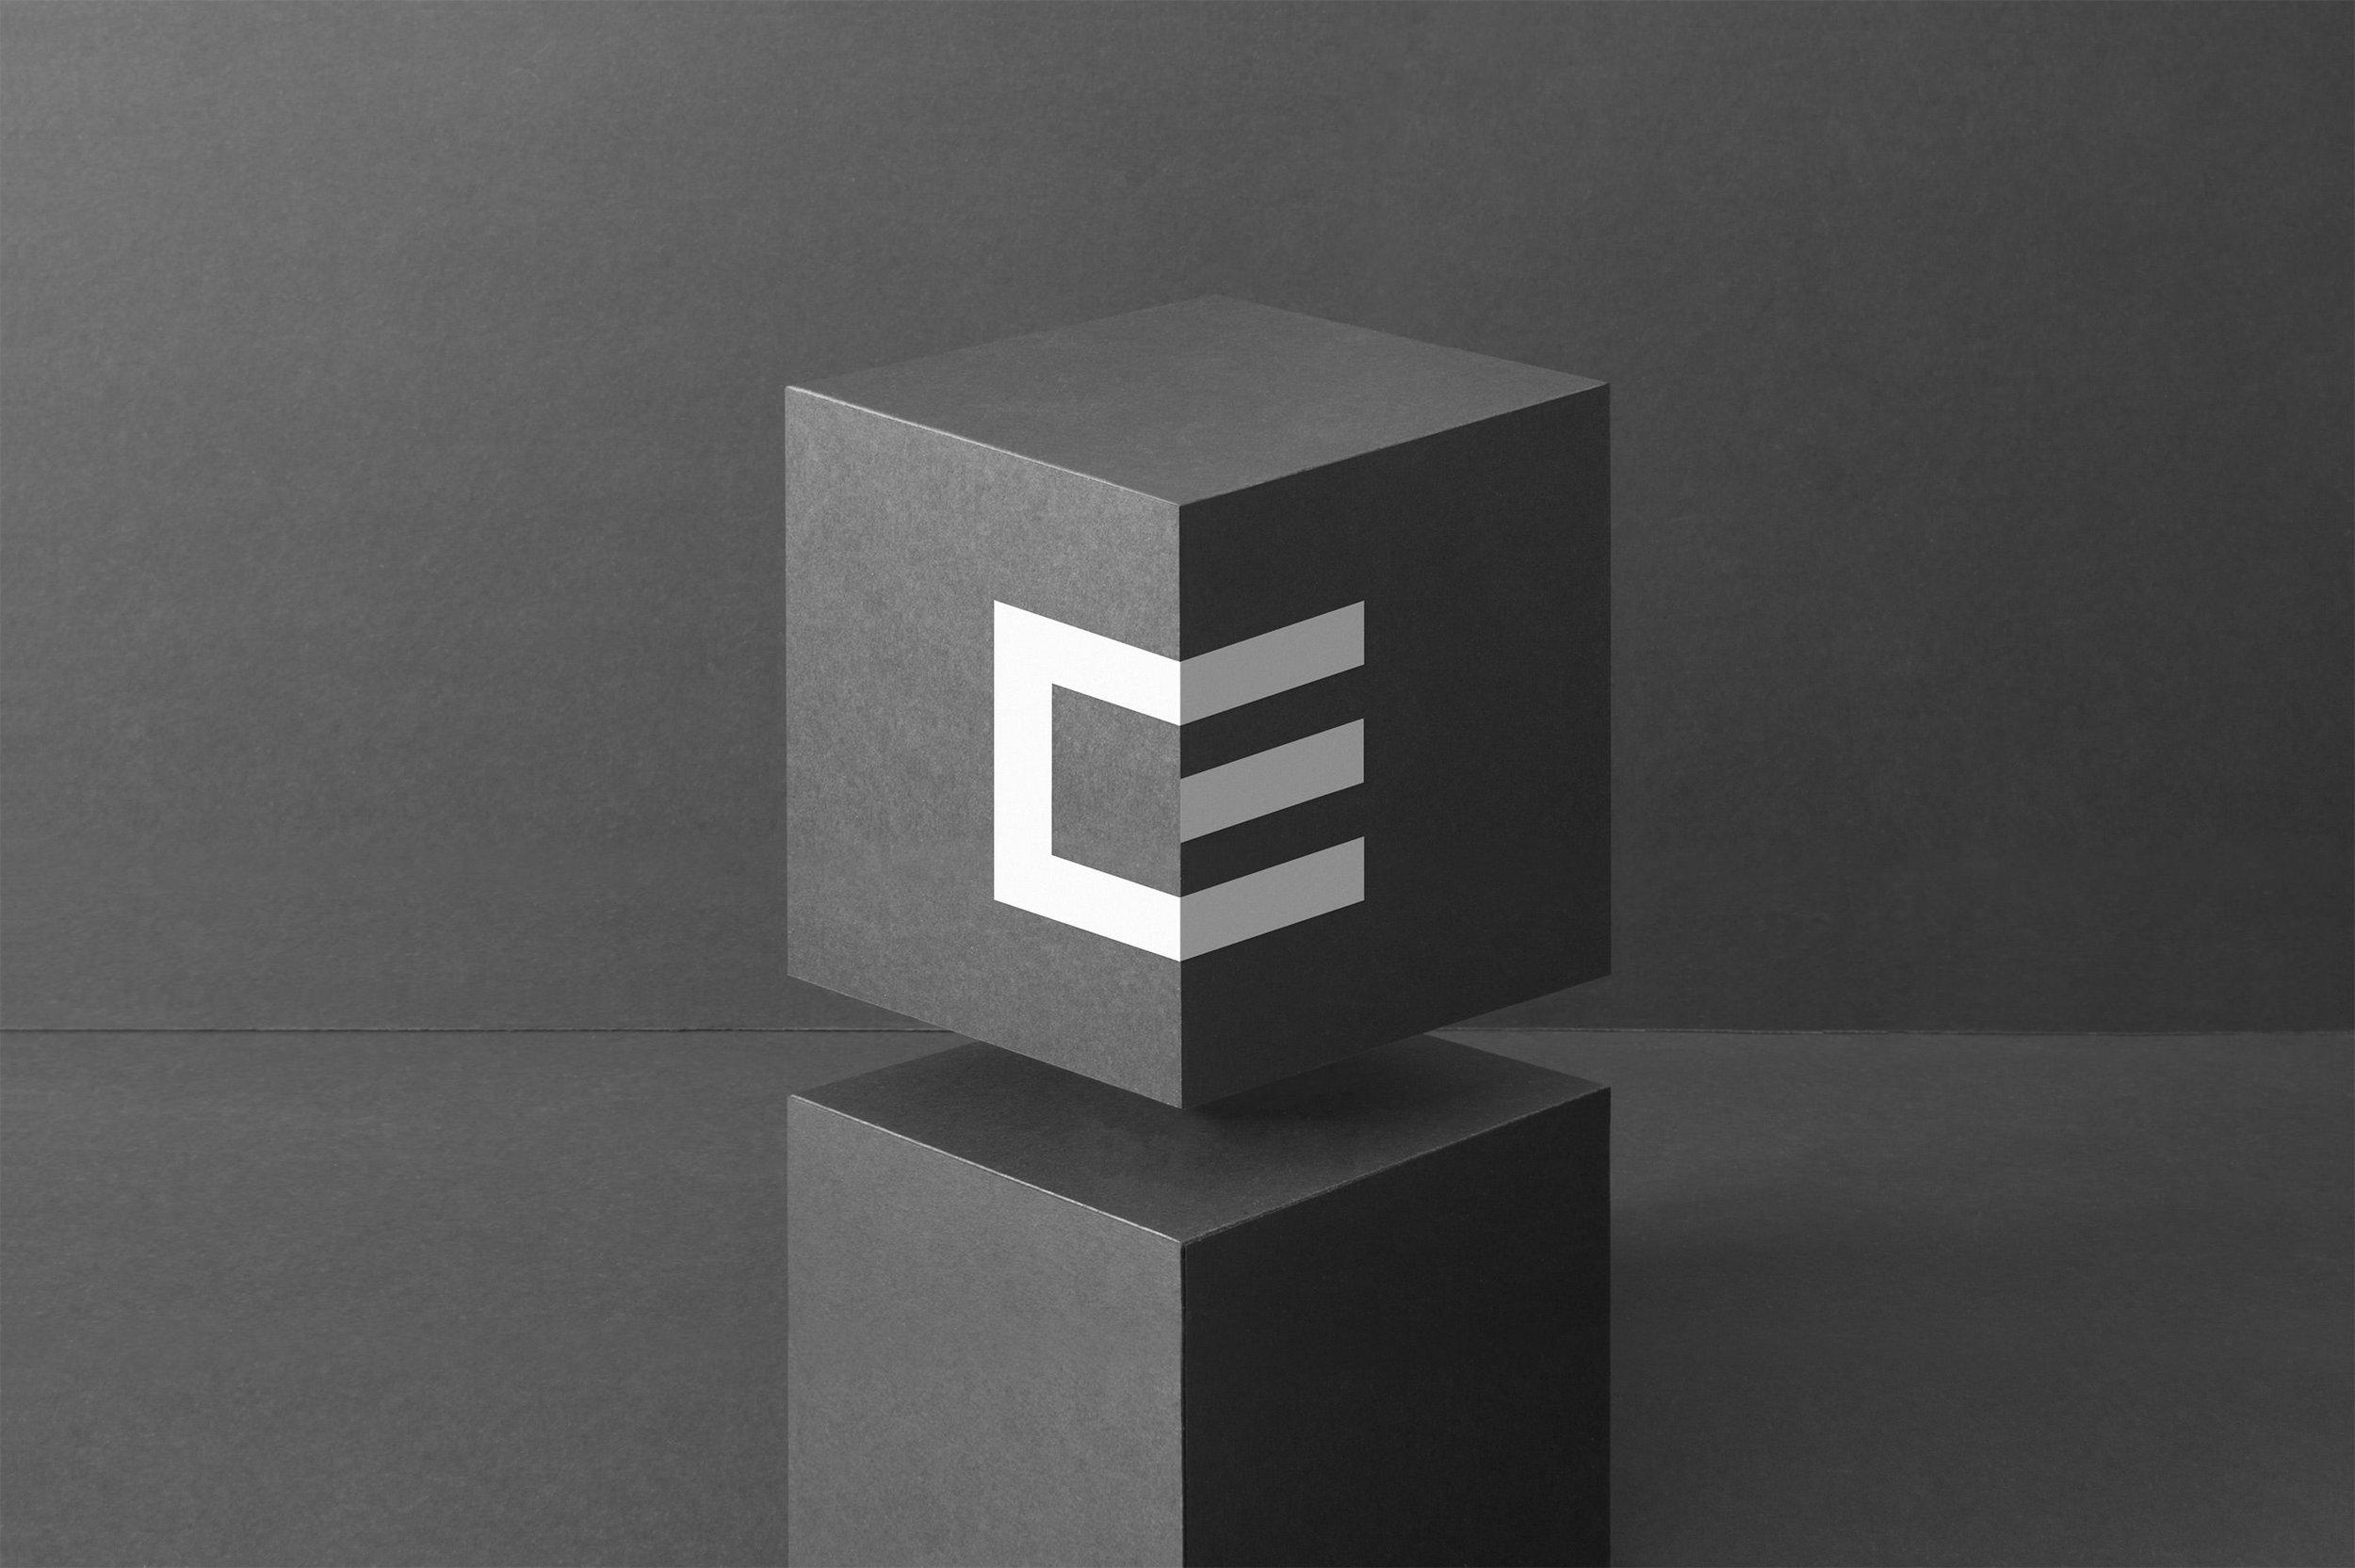 Figure-Jeremy-Hall-Design-Graphique-Quebec-Logo-Branding-Image-De-Marque-Item-Construction-8.jpg